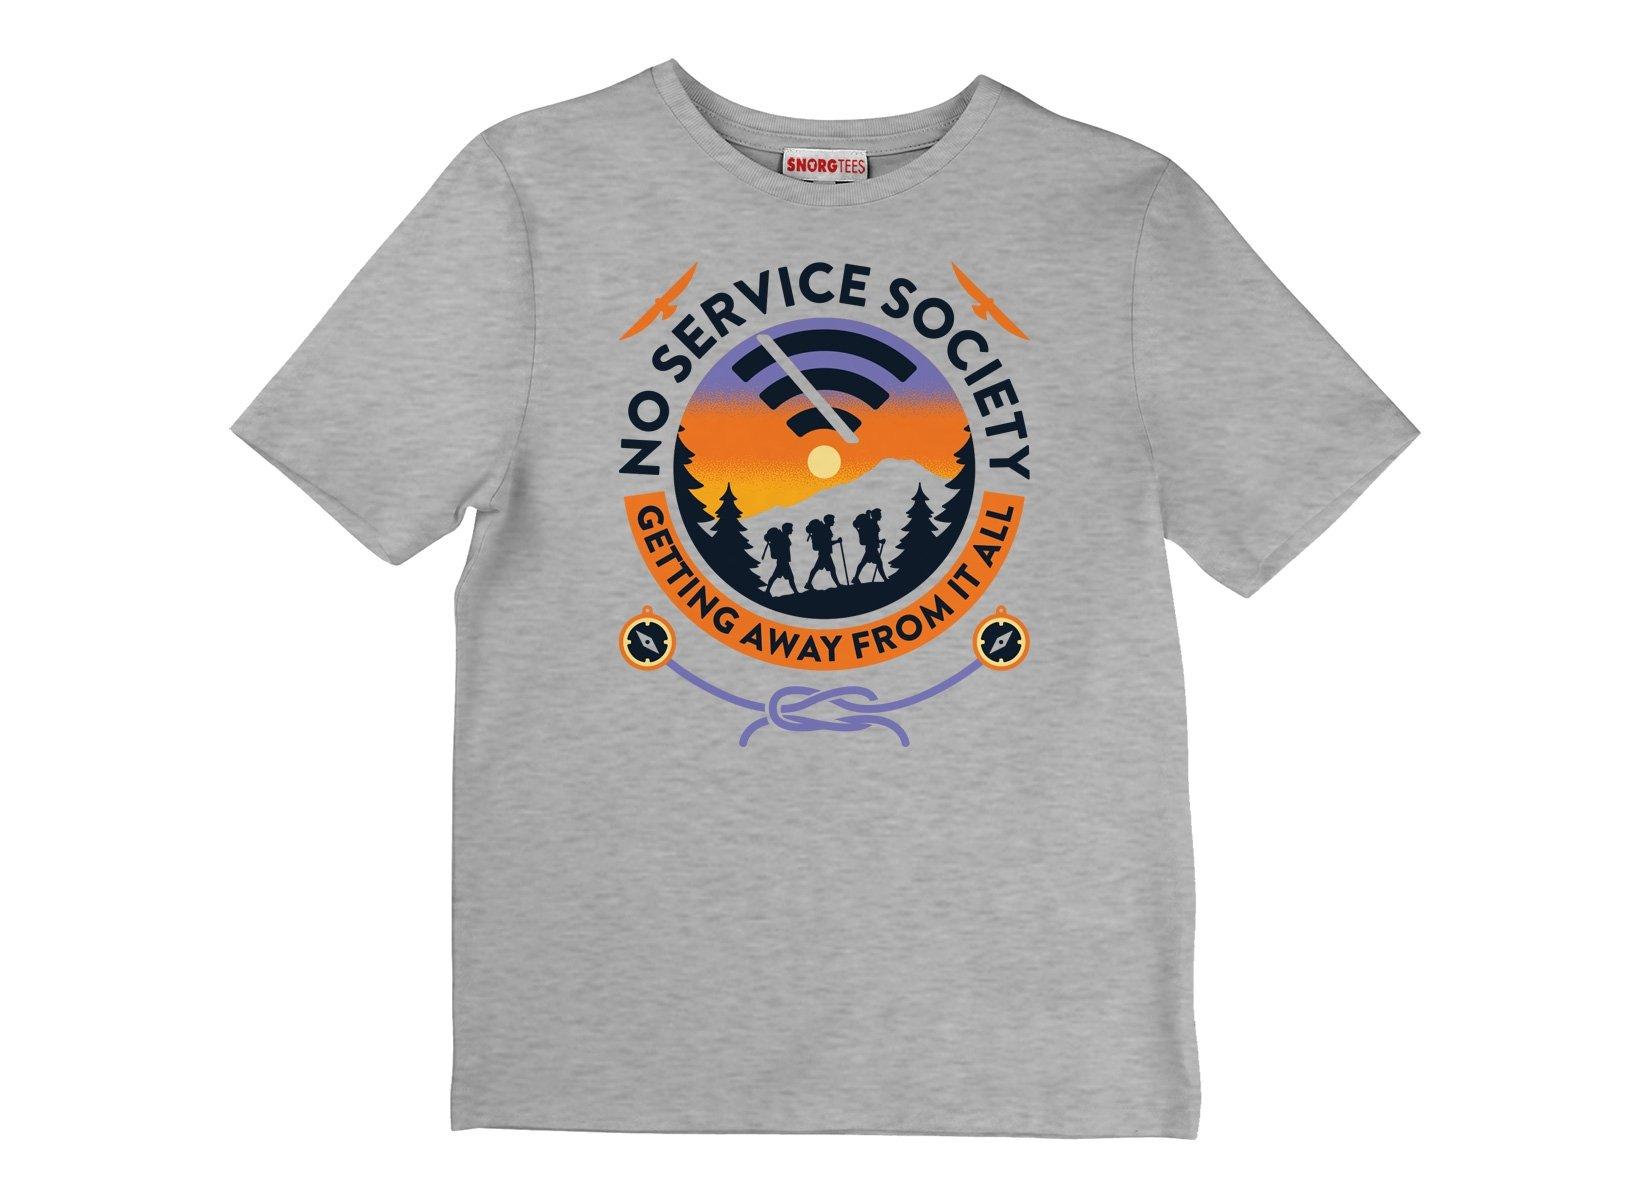 No Service Society on Kids T-Shirt